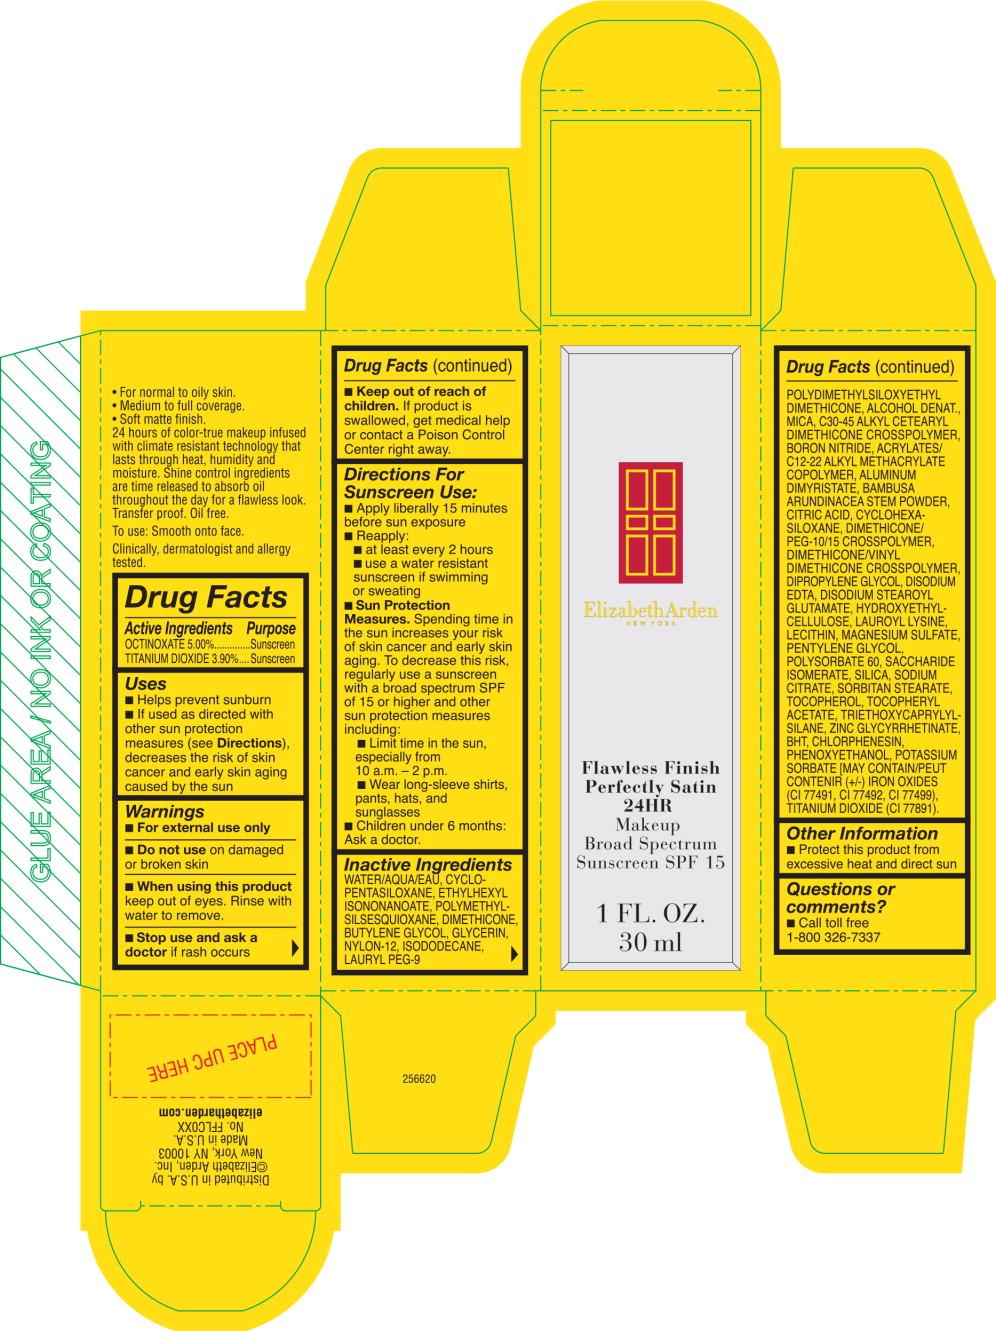 Flawless Finish Perfectly Satinb 24hr Makeup Shade Cameo (Octinoxate, Titanium Dioxide) Cream [Elizabeth Arden, Inc]